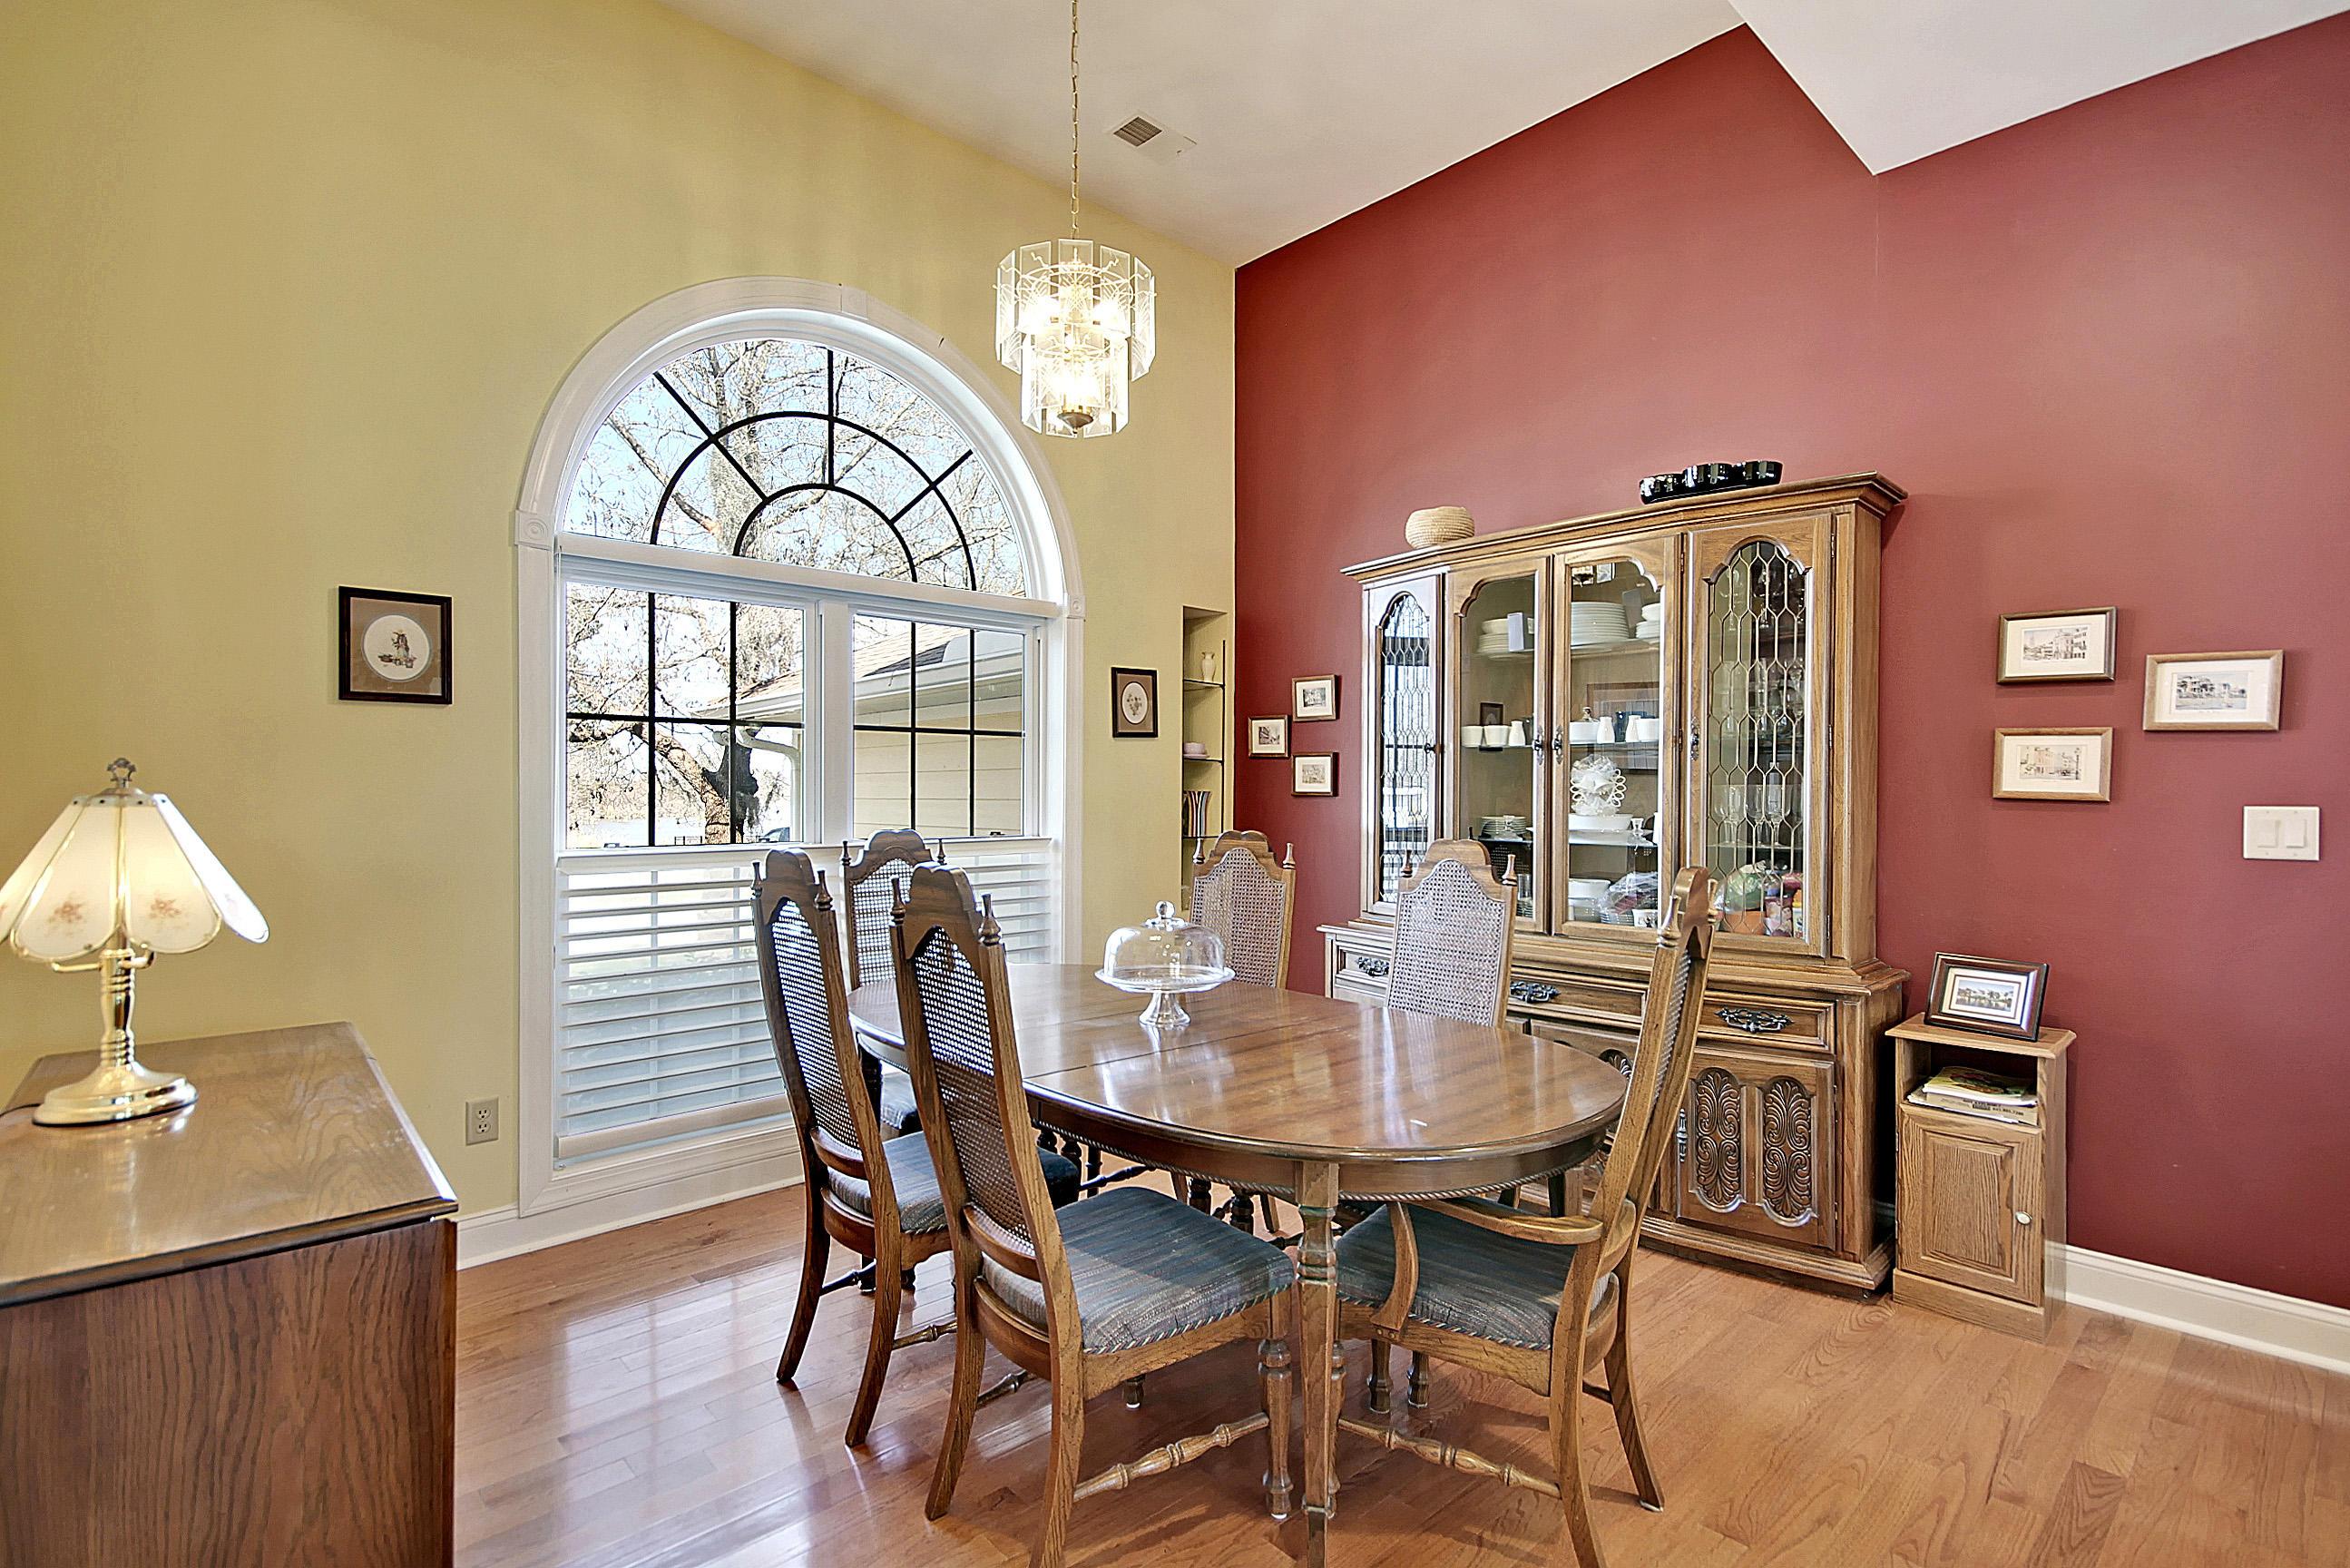 Cross Subd (Longpoint) Homes For Sale - 1191 Longpoint, Cross, SC - 31